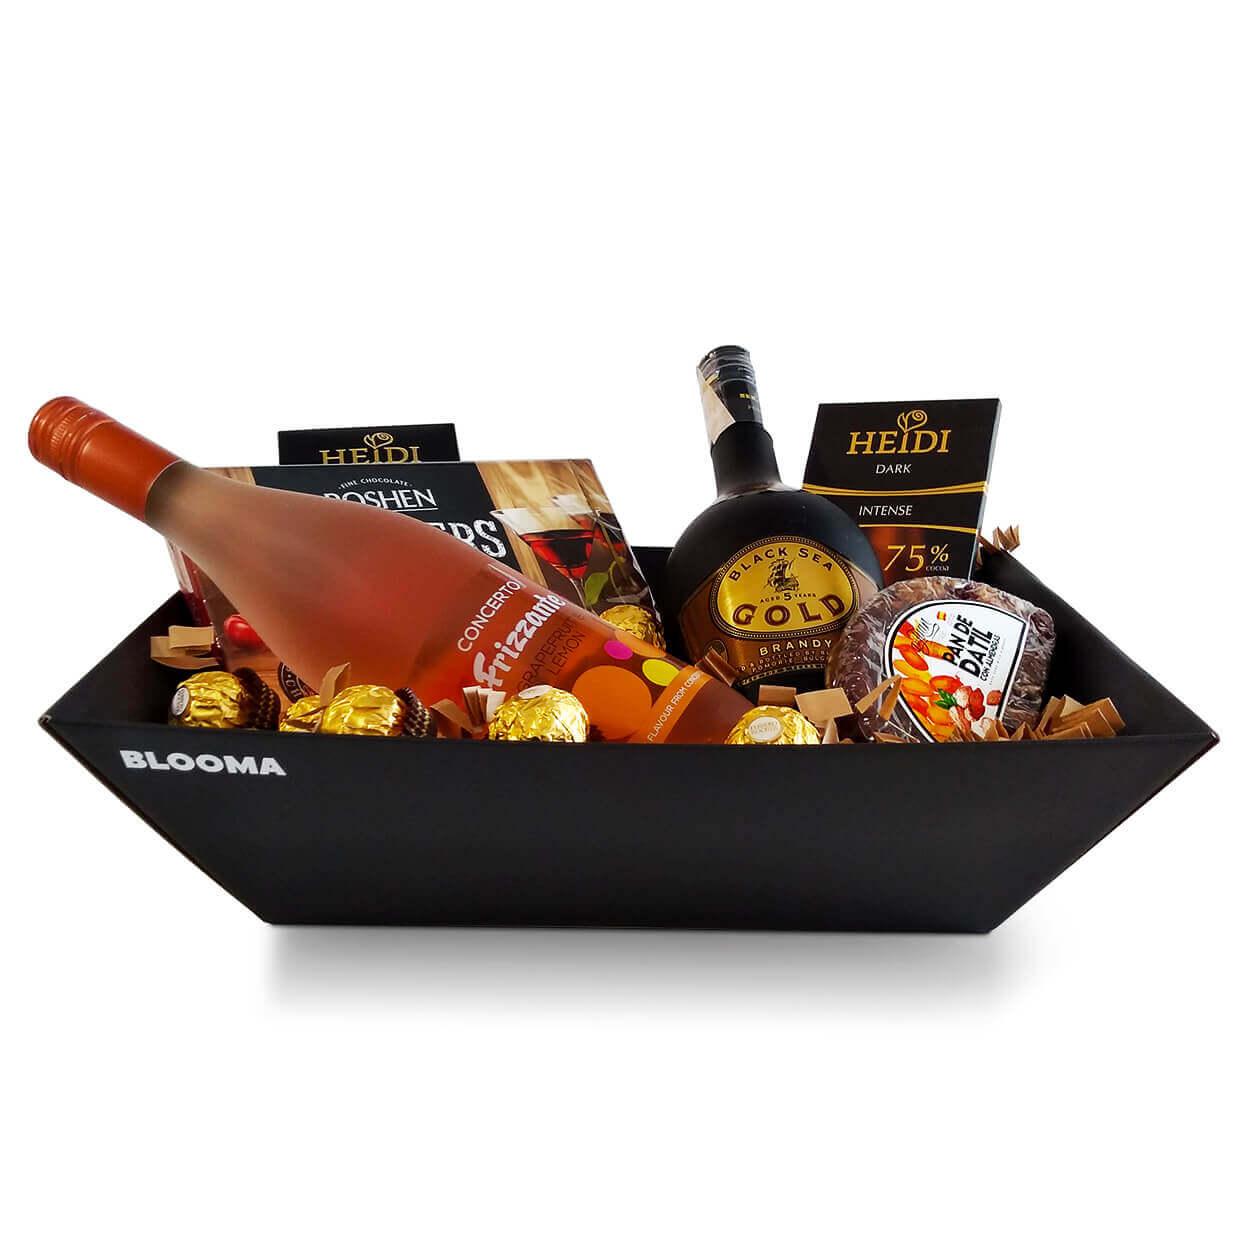 кутия злато с бренди black sea gold, напитка грейпфрут и лимон, фурми, 2 броя шоколади хайди и бонбони shooters и фереро рошер